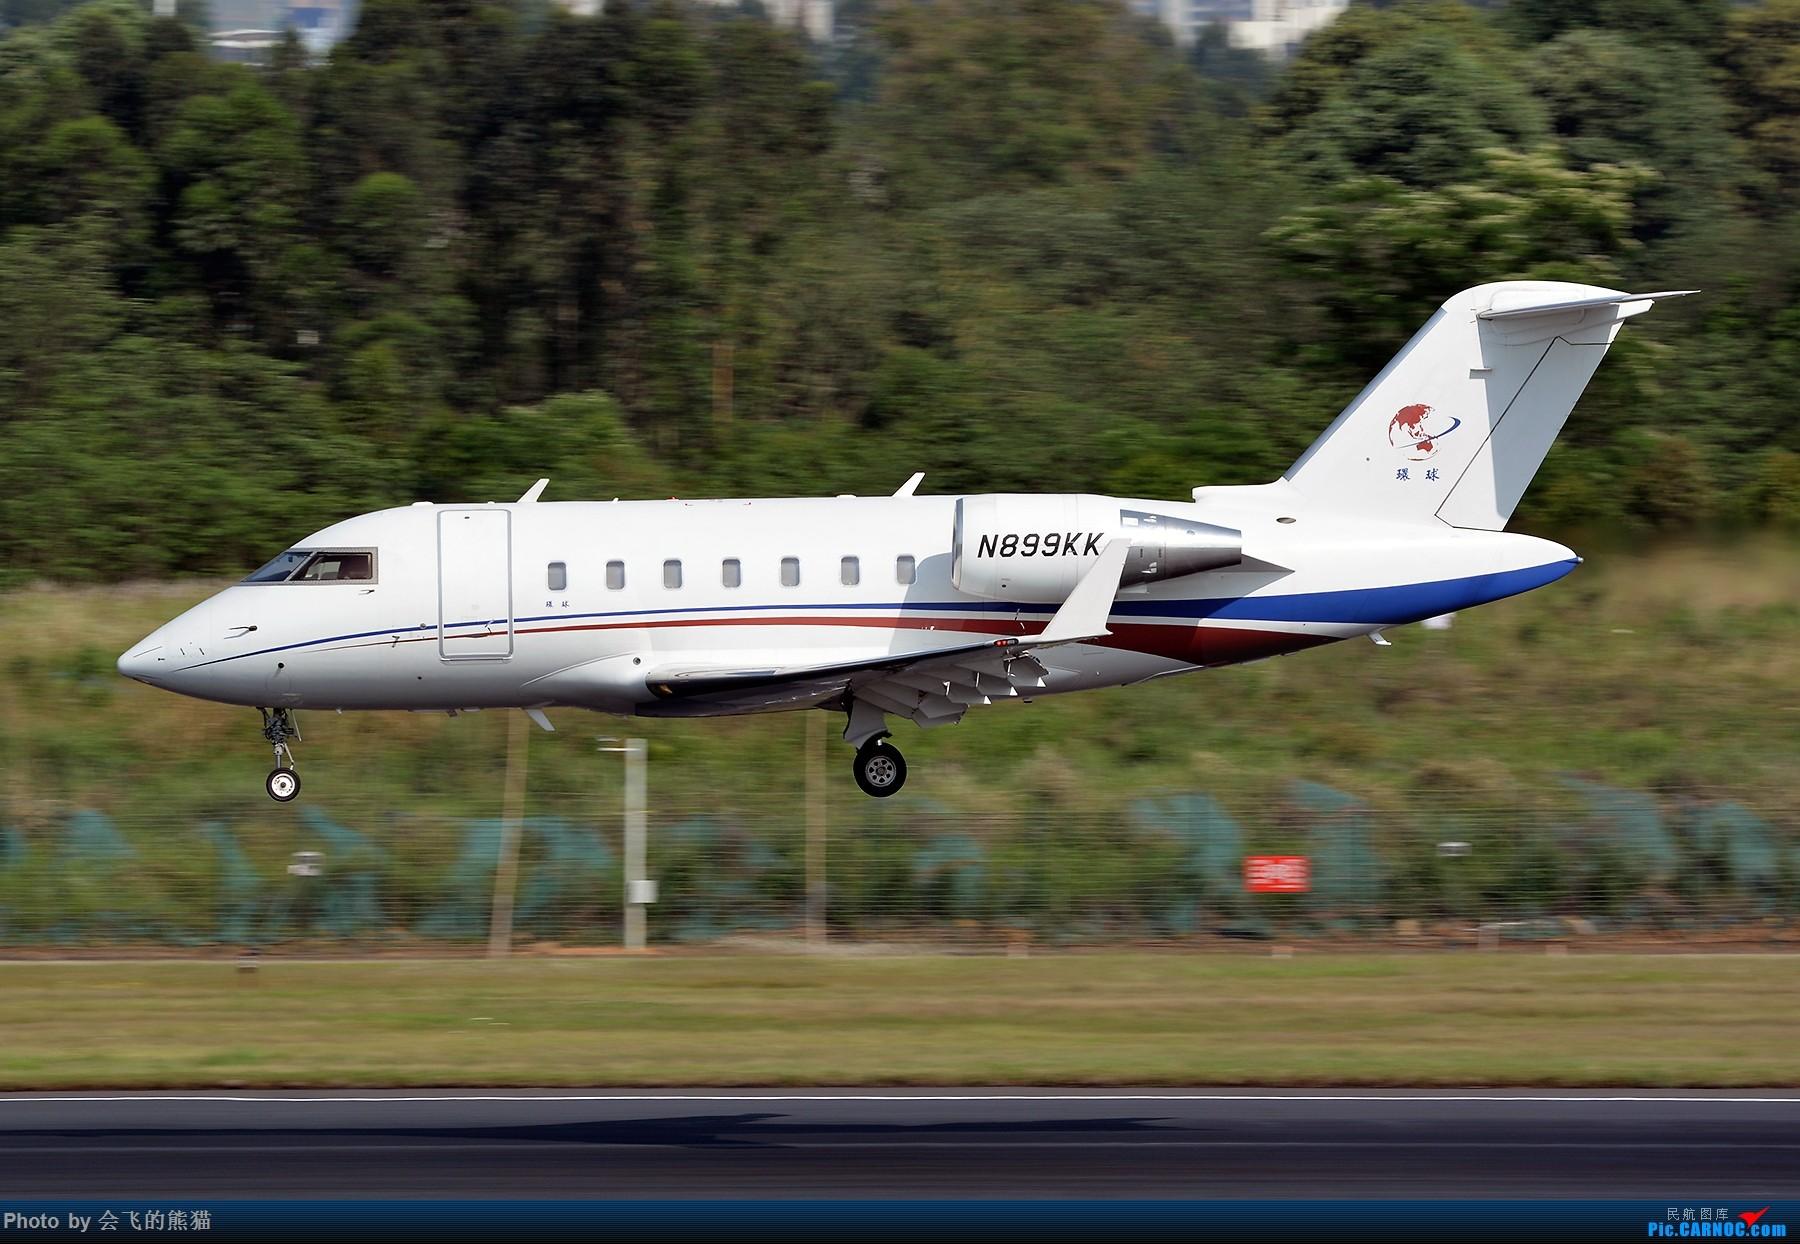 Re:[原创]偷得浮生半日闲 BOMBARDIER CL605 N899KK 中国成都双流国际机场